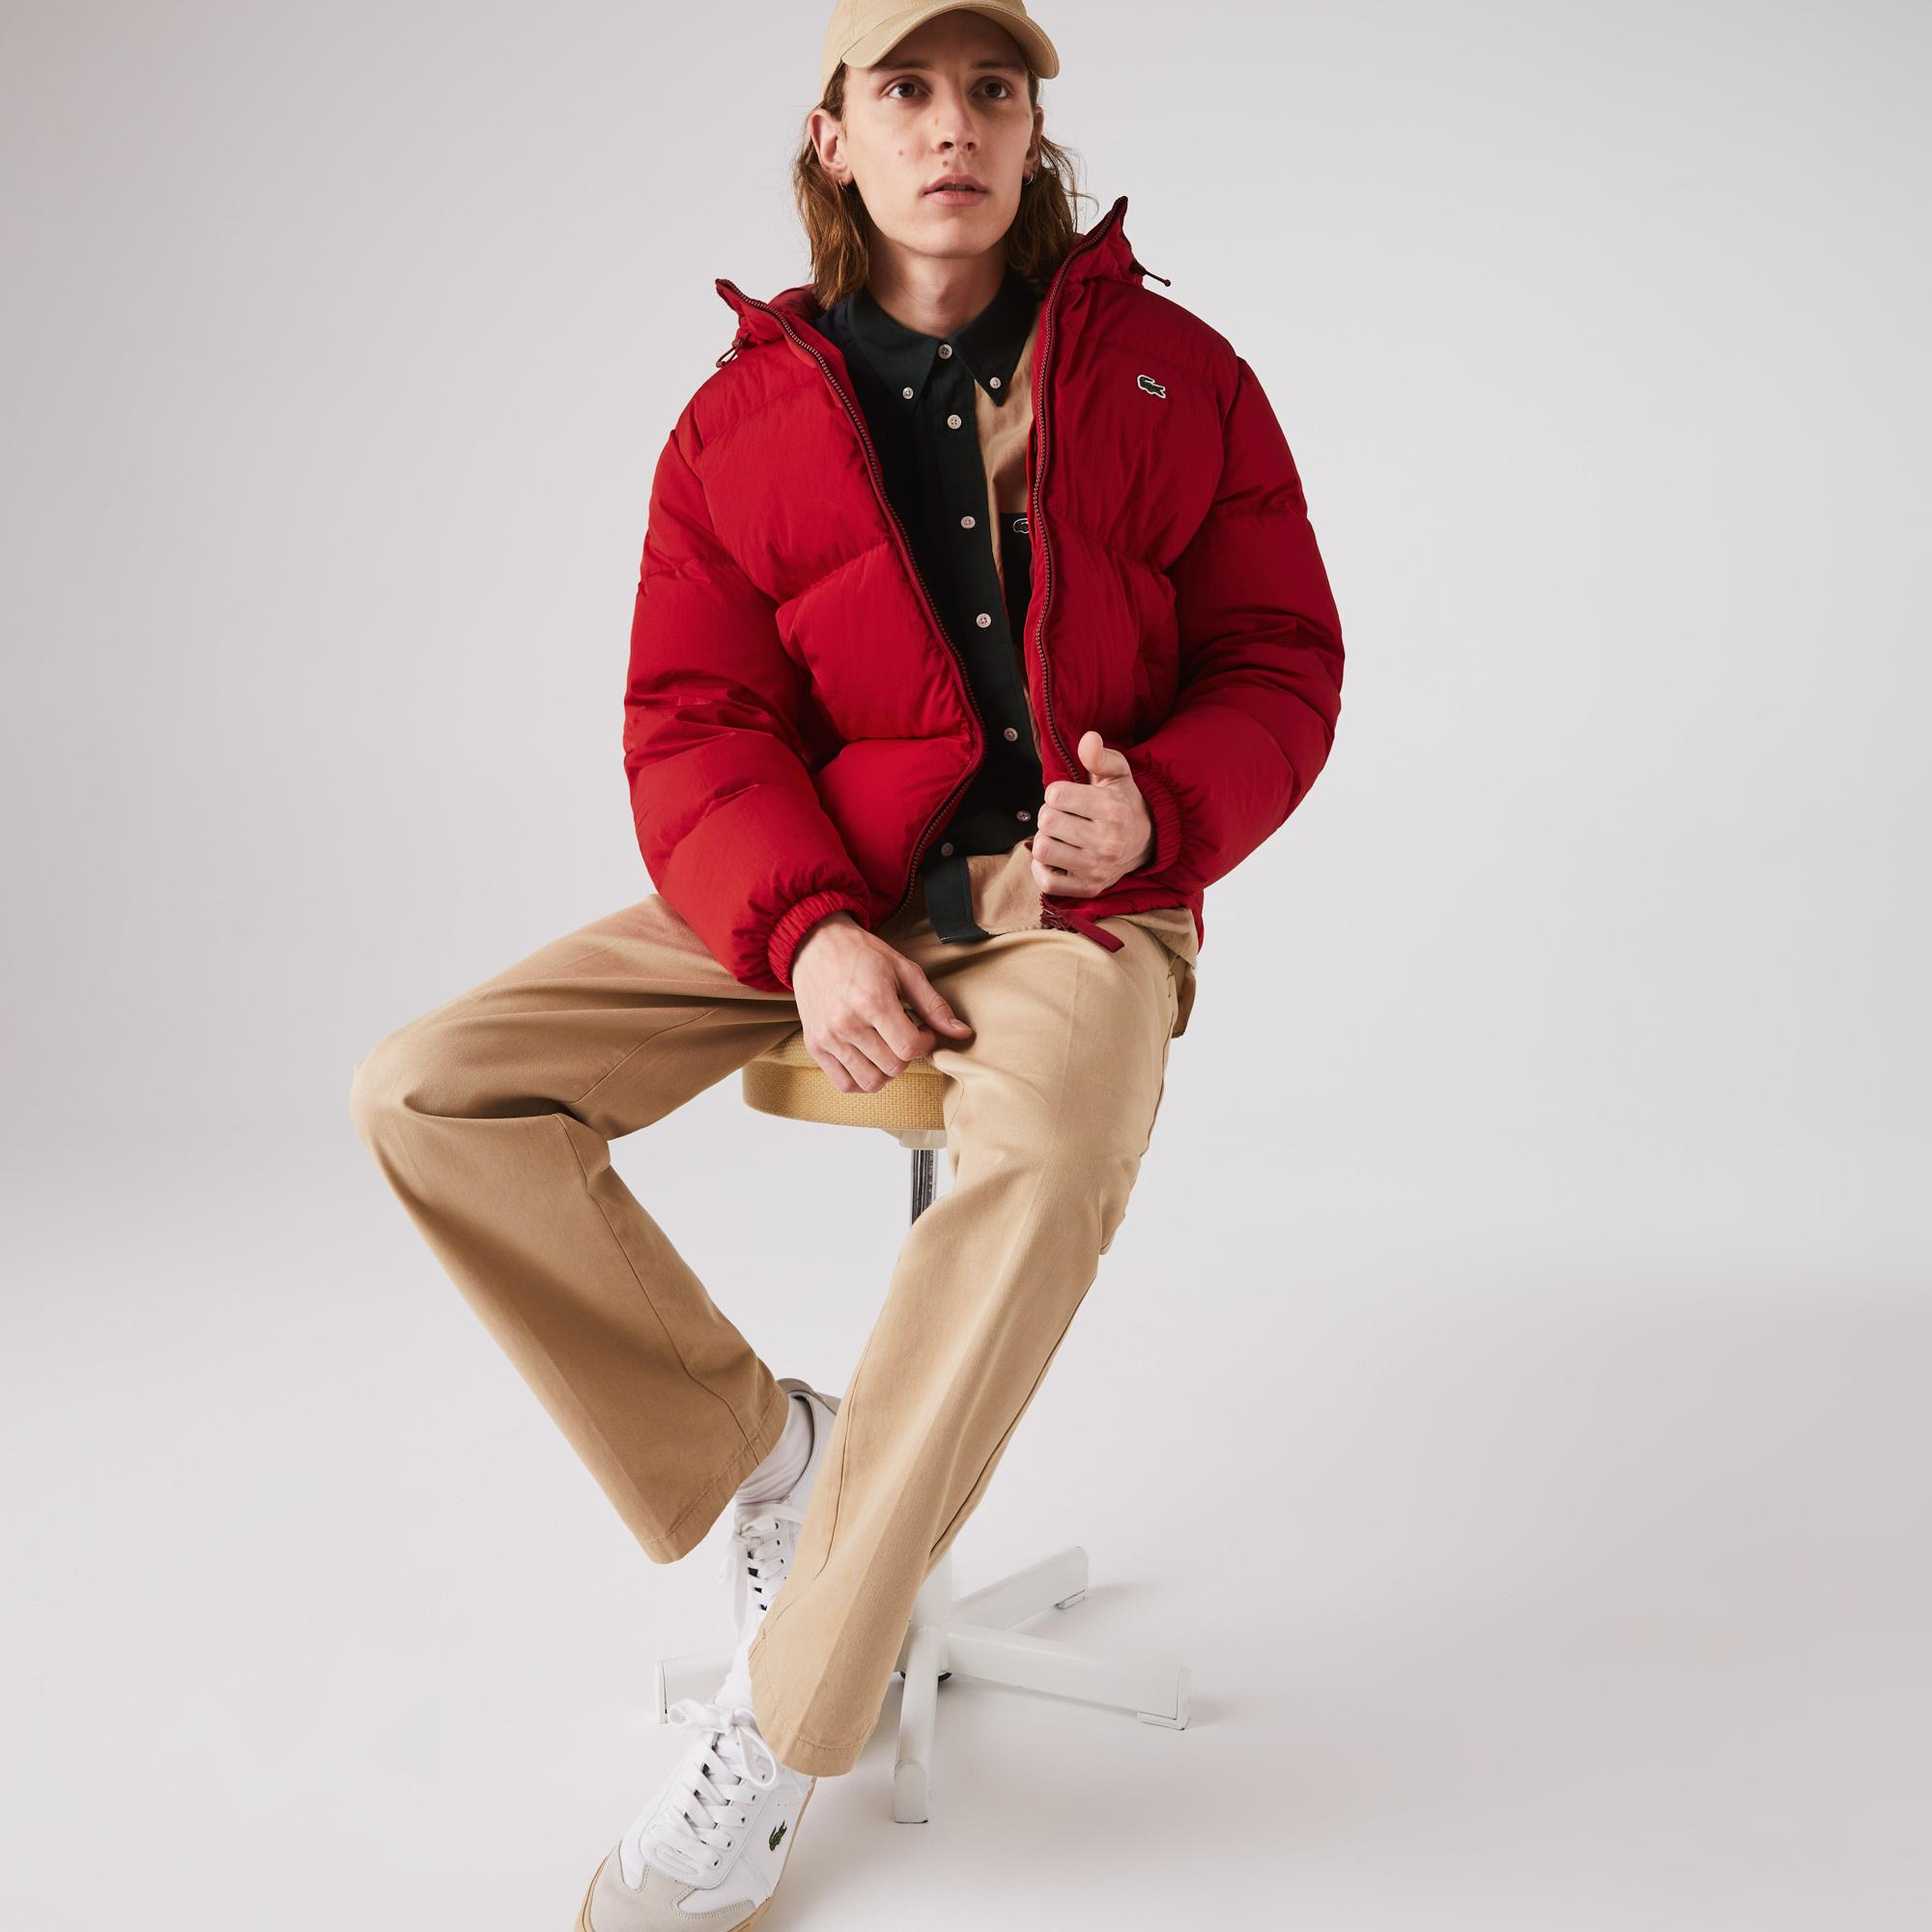 Lacoste Erkek Kapitone Kapüşonlu Kırmızı Mont